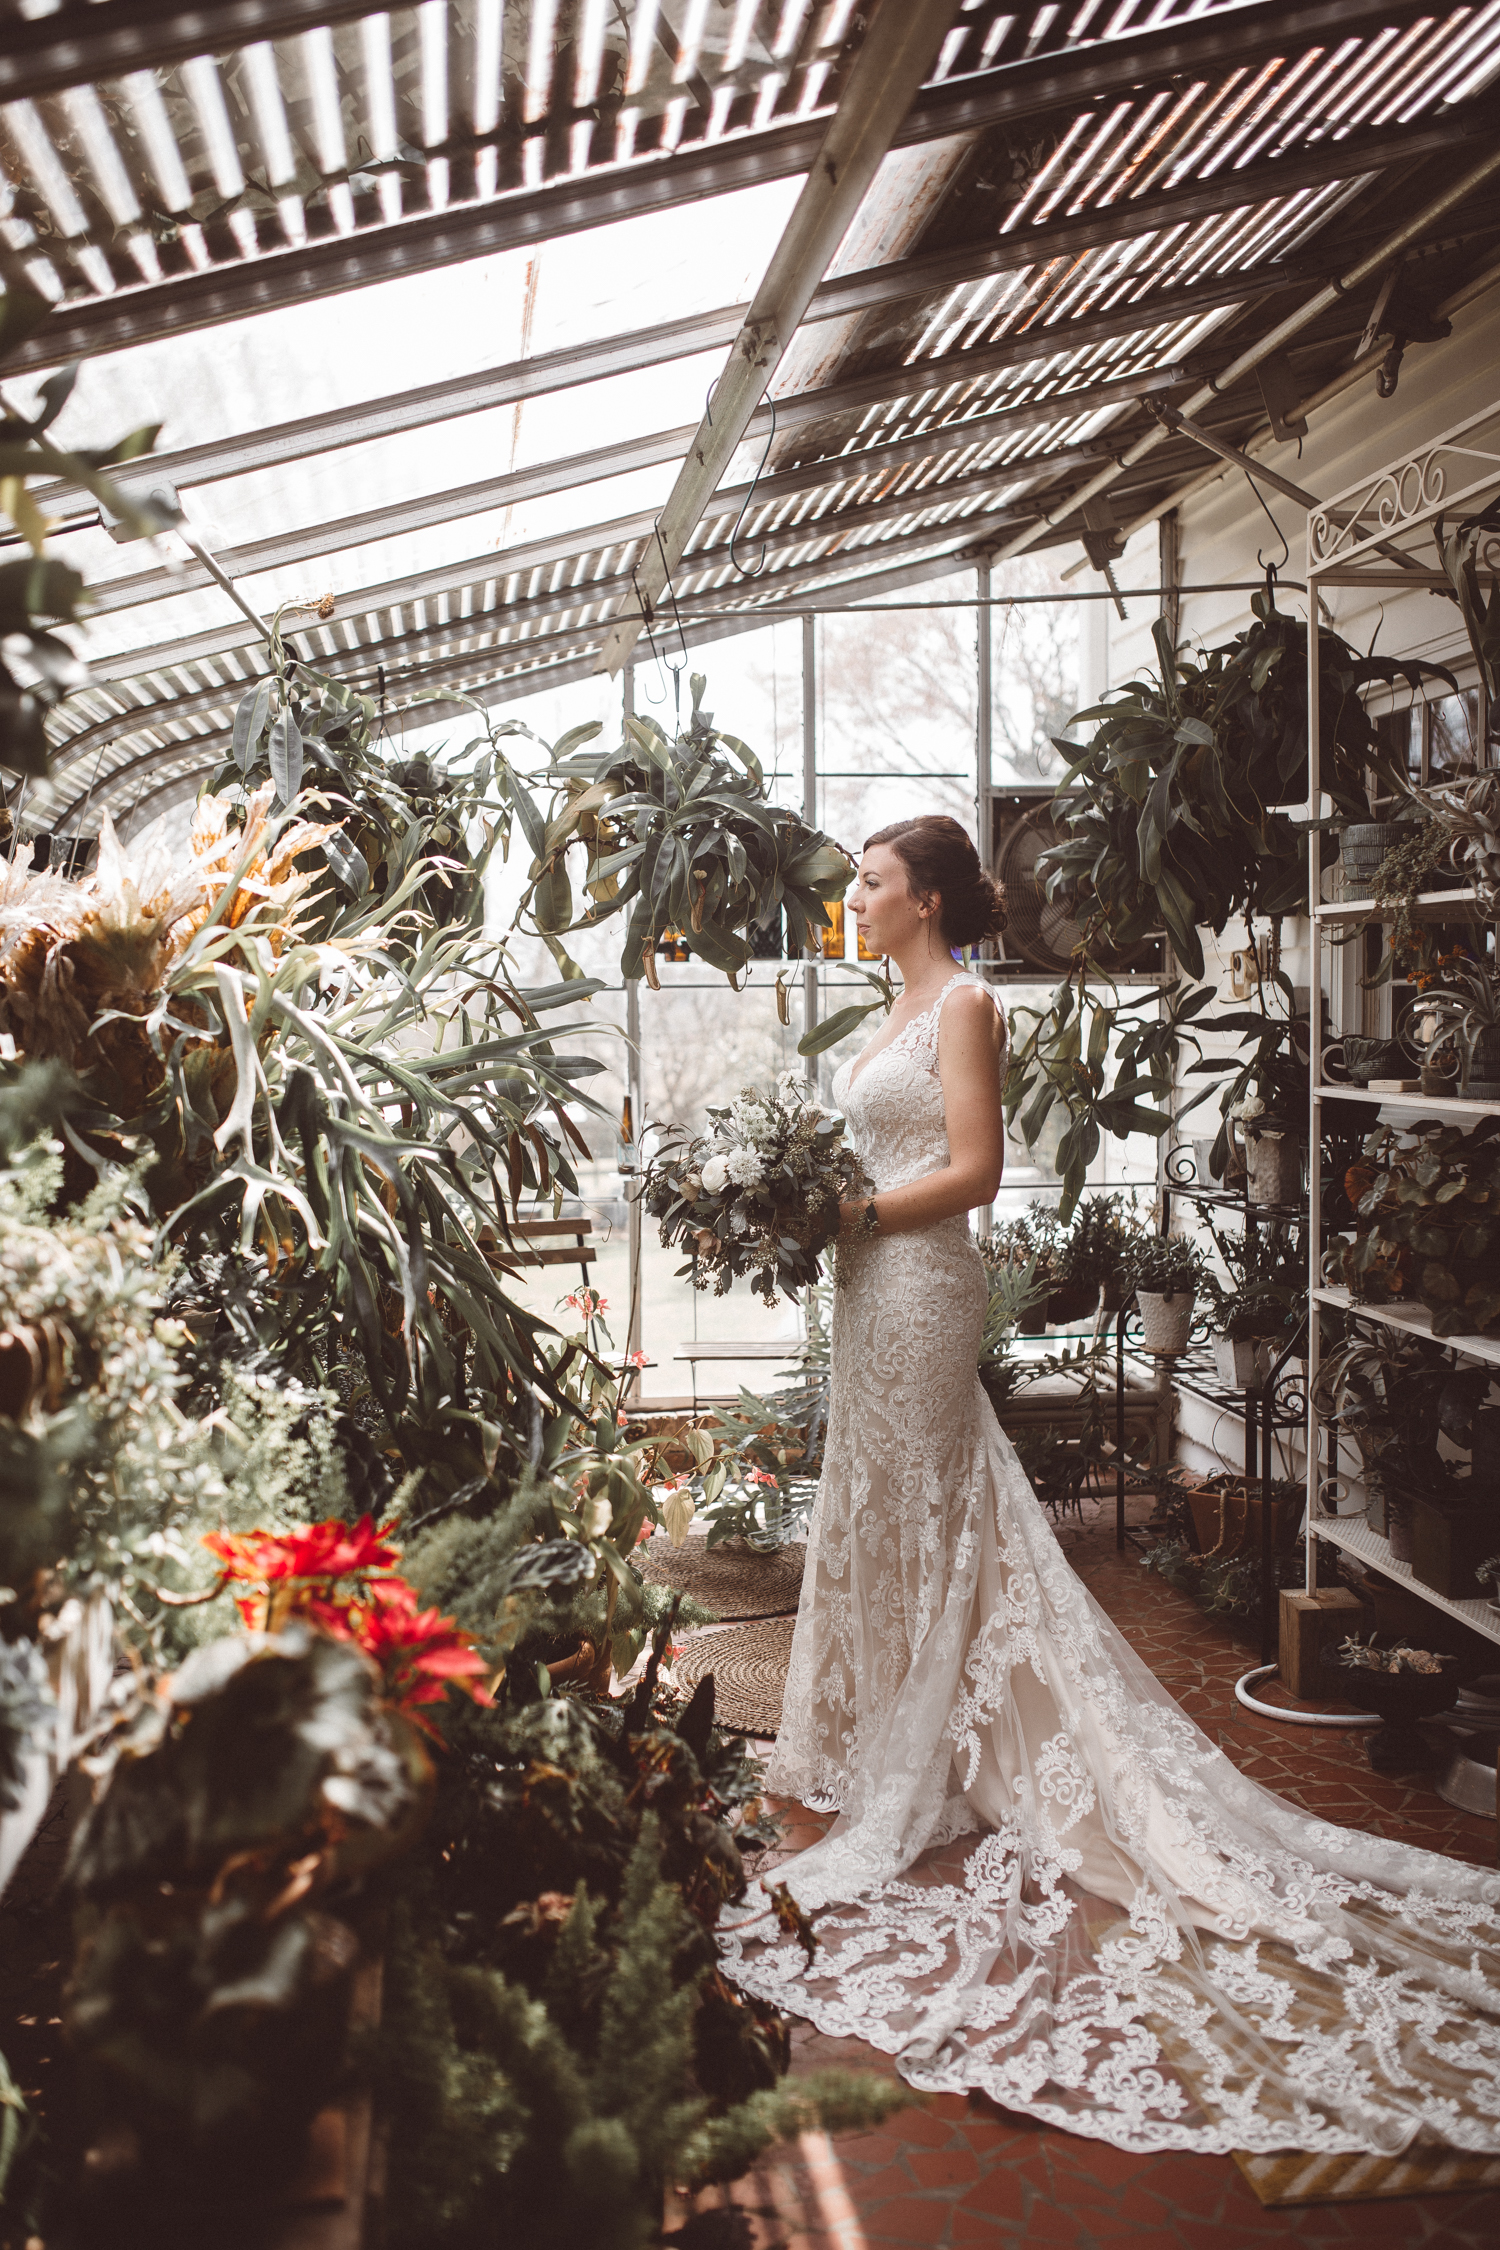 KDP_lindsey&taylor_wedding-159.JPG